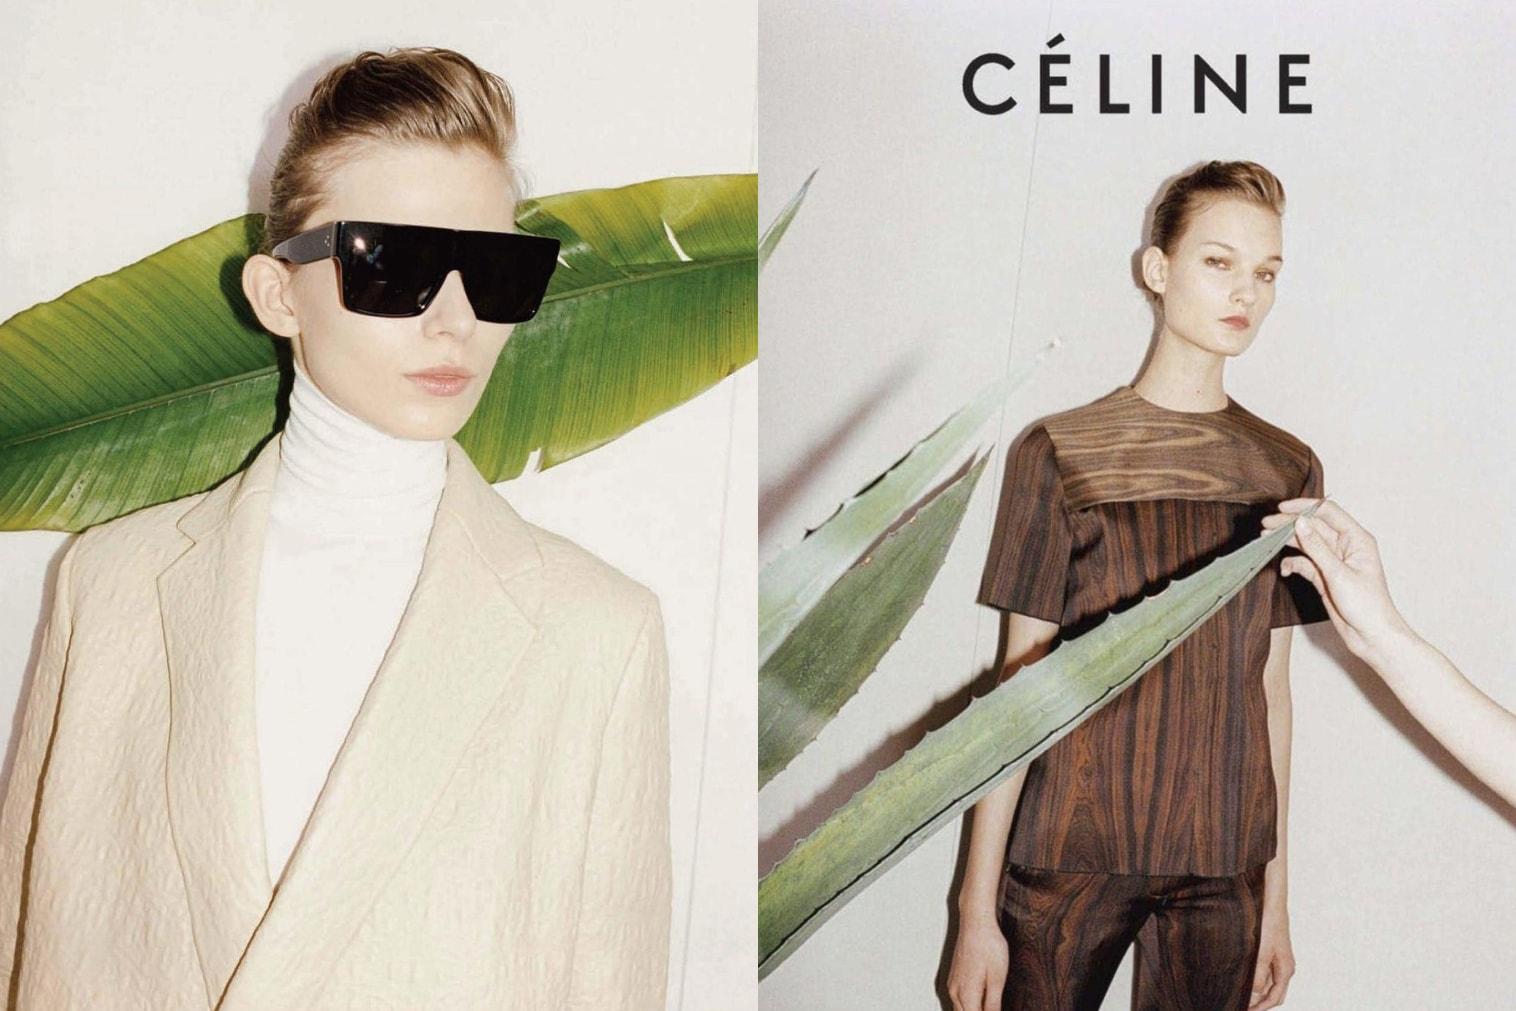 Hedi Slimane Celine Saint Laurent Op-Ed